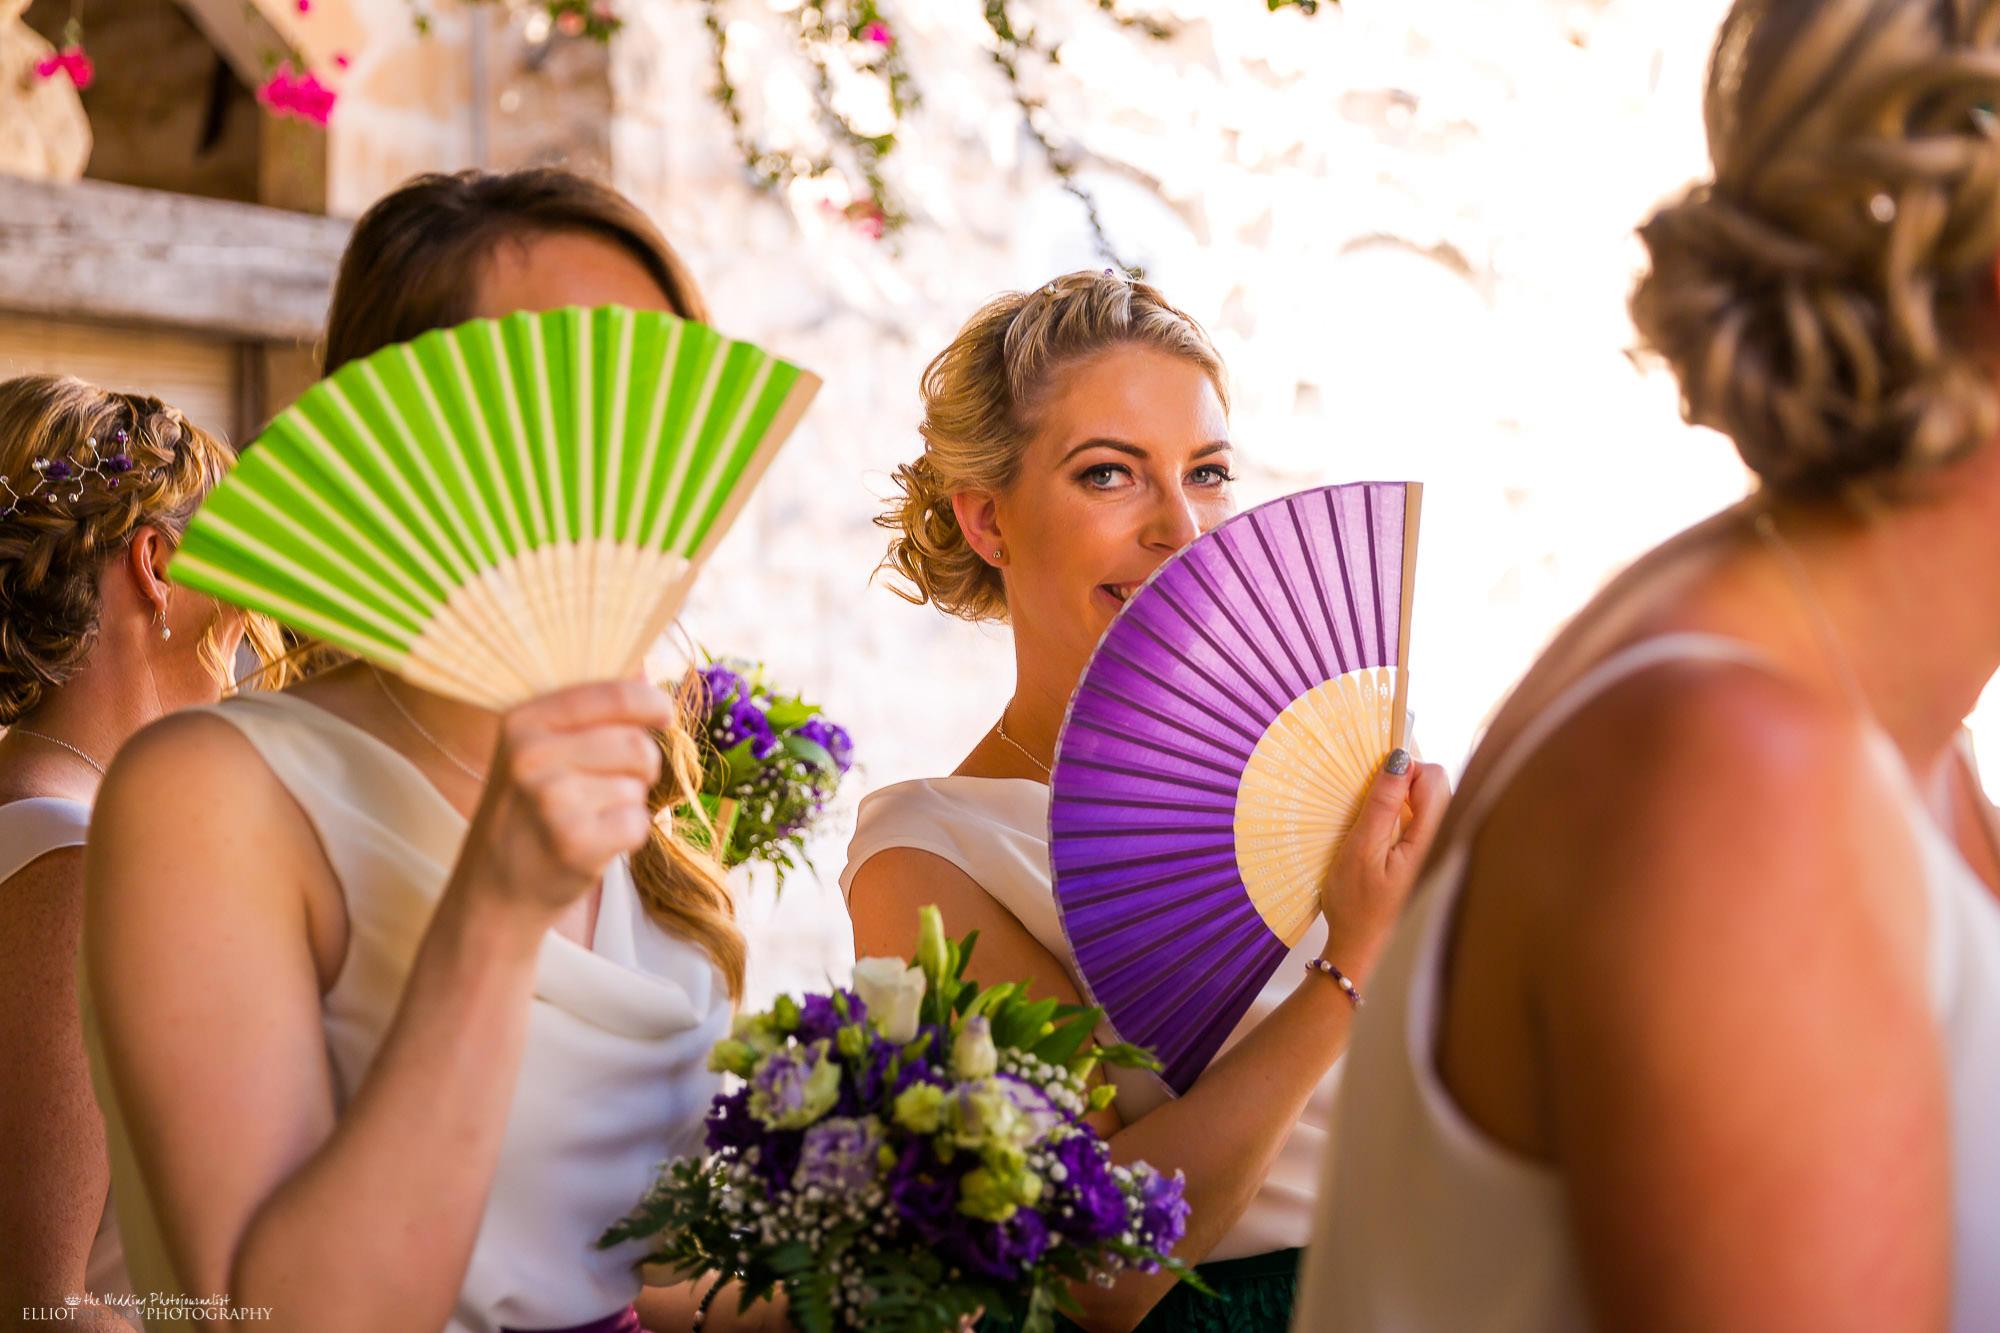 bridesmaid-fan-destination-wedding-fun-ceremony-photography-Malta-destination-weddings